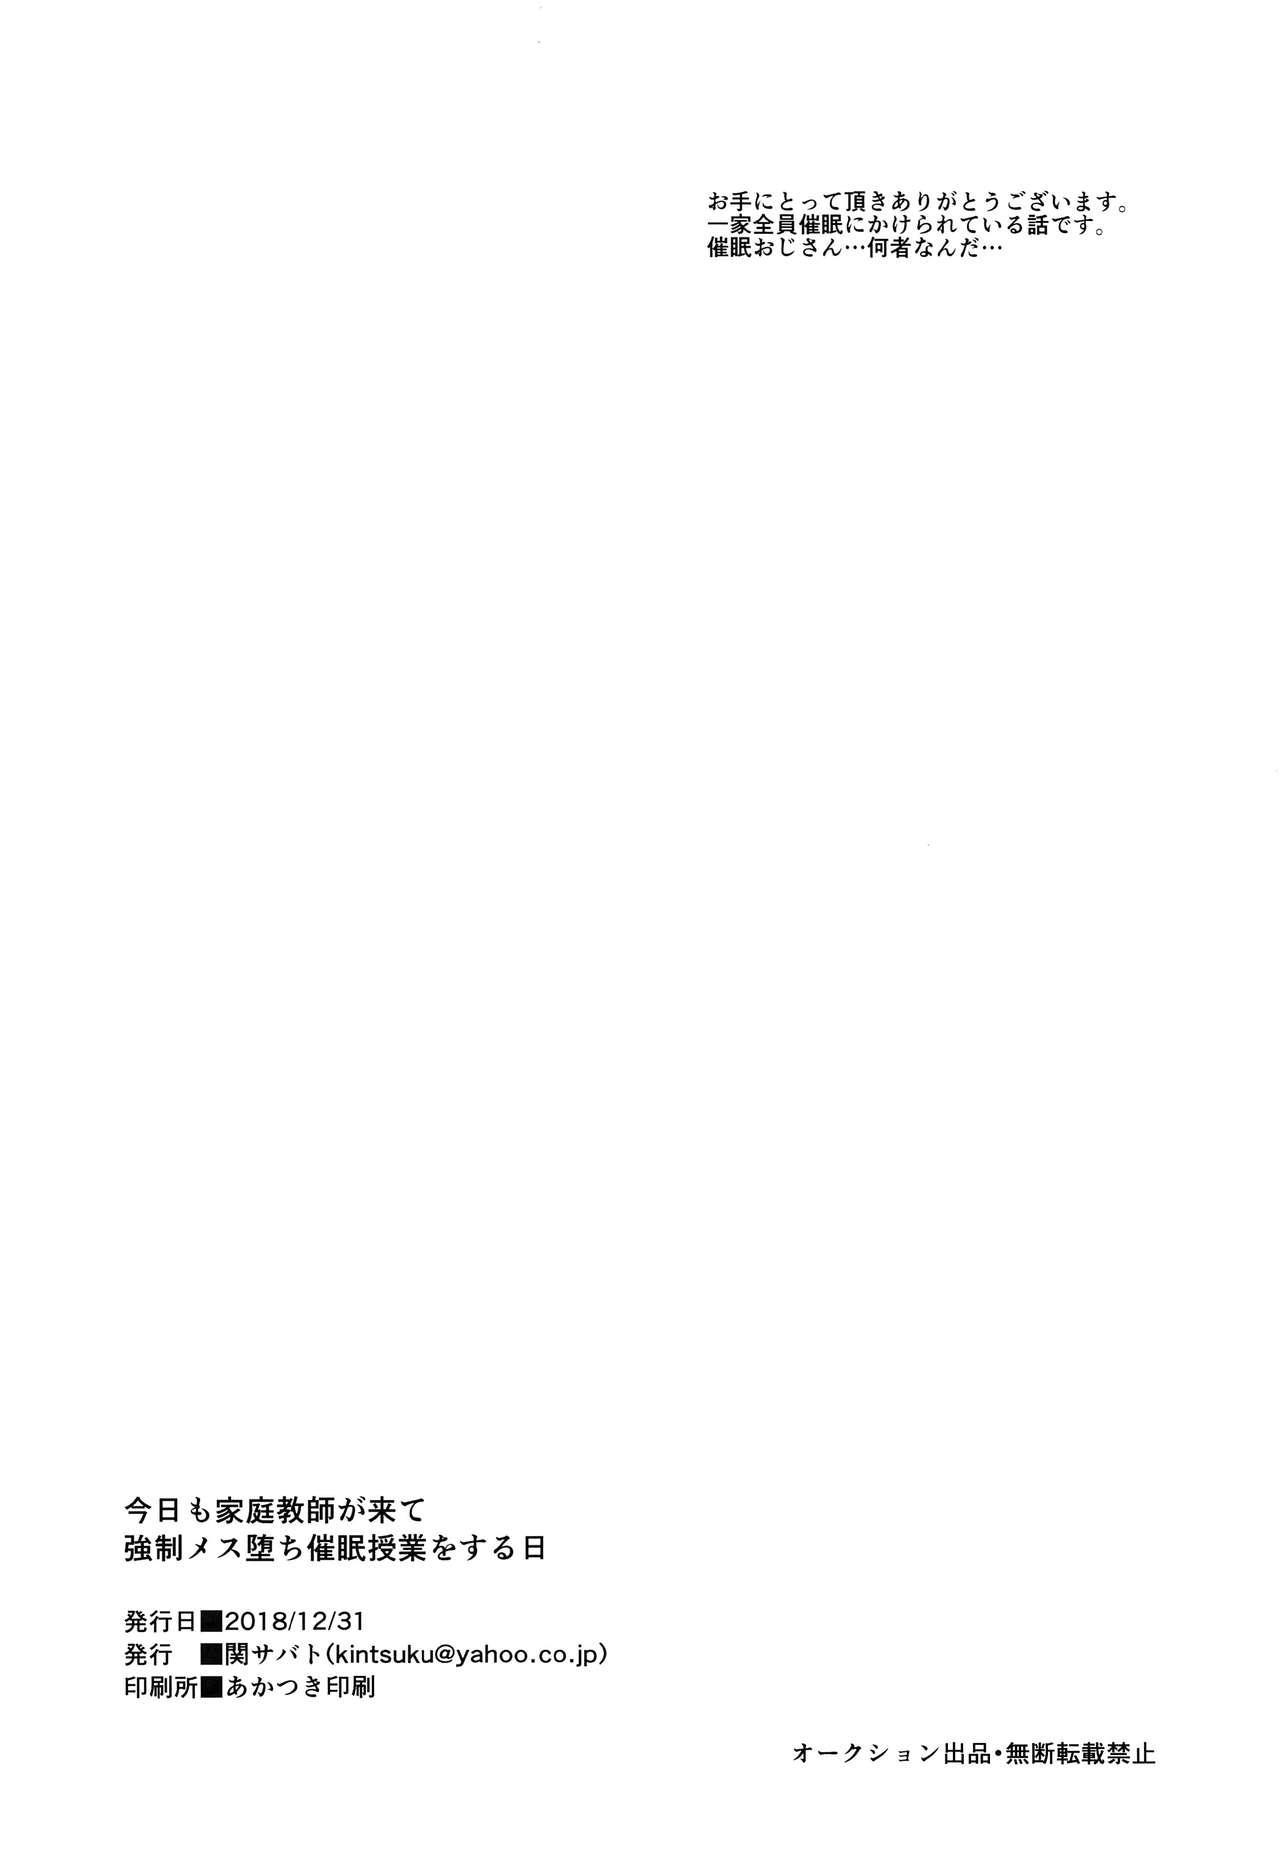 Kyou mo Kateikyoushi ga Kite Kyousei Mesuochi Saiminnjugyou o Suruhi 16